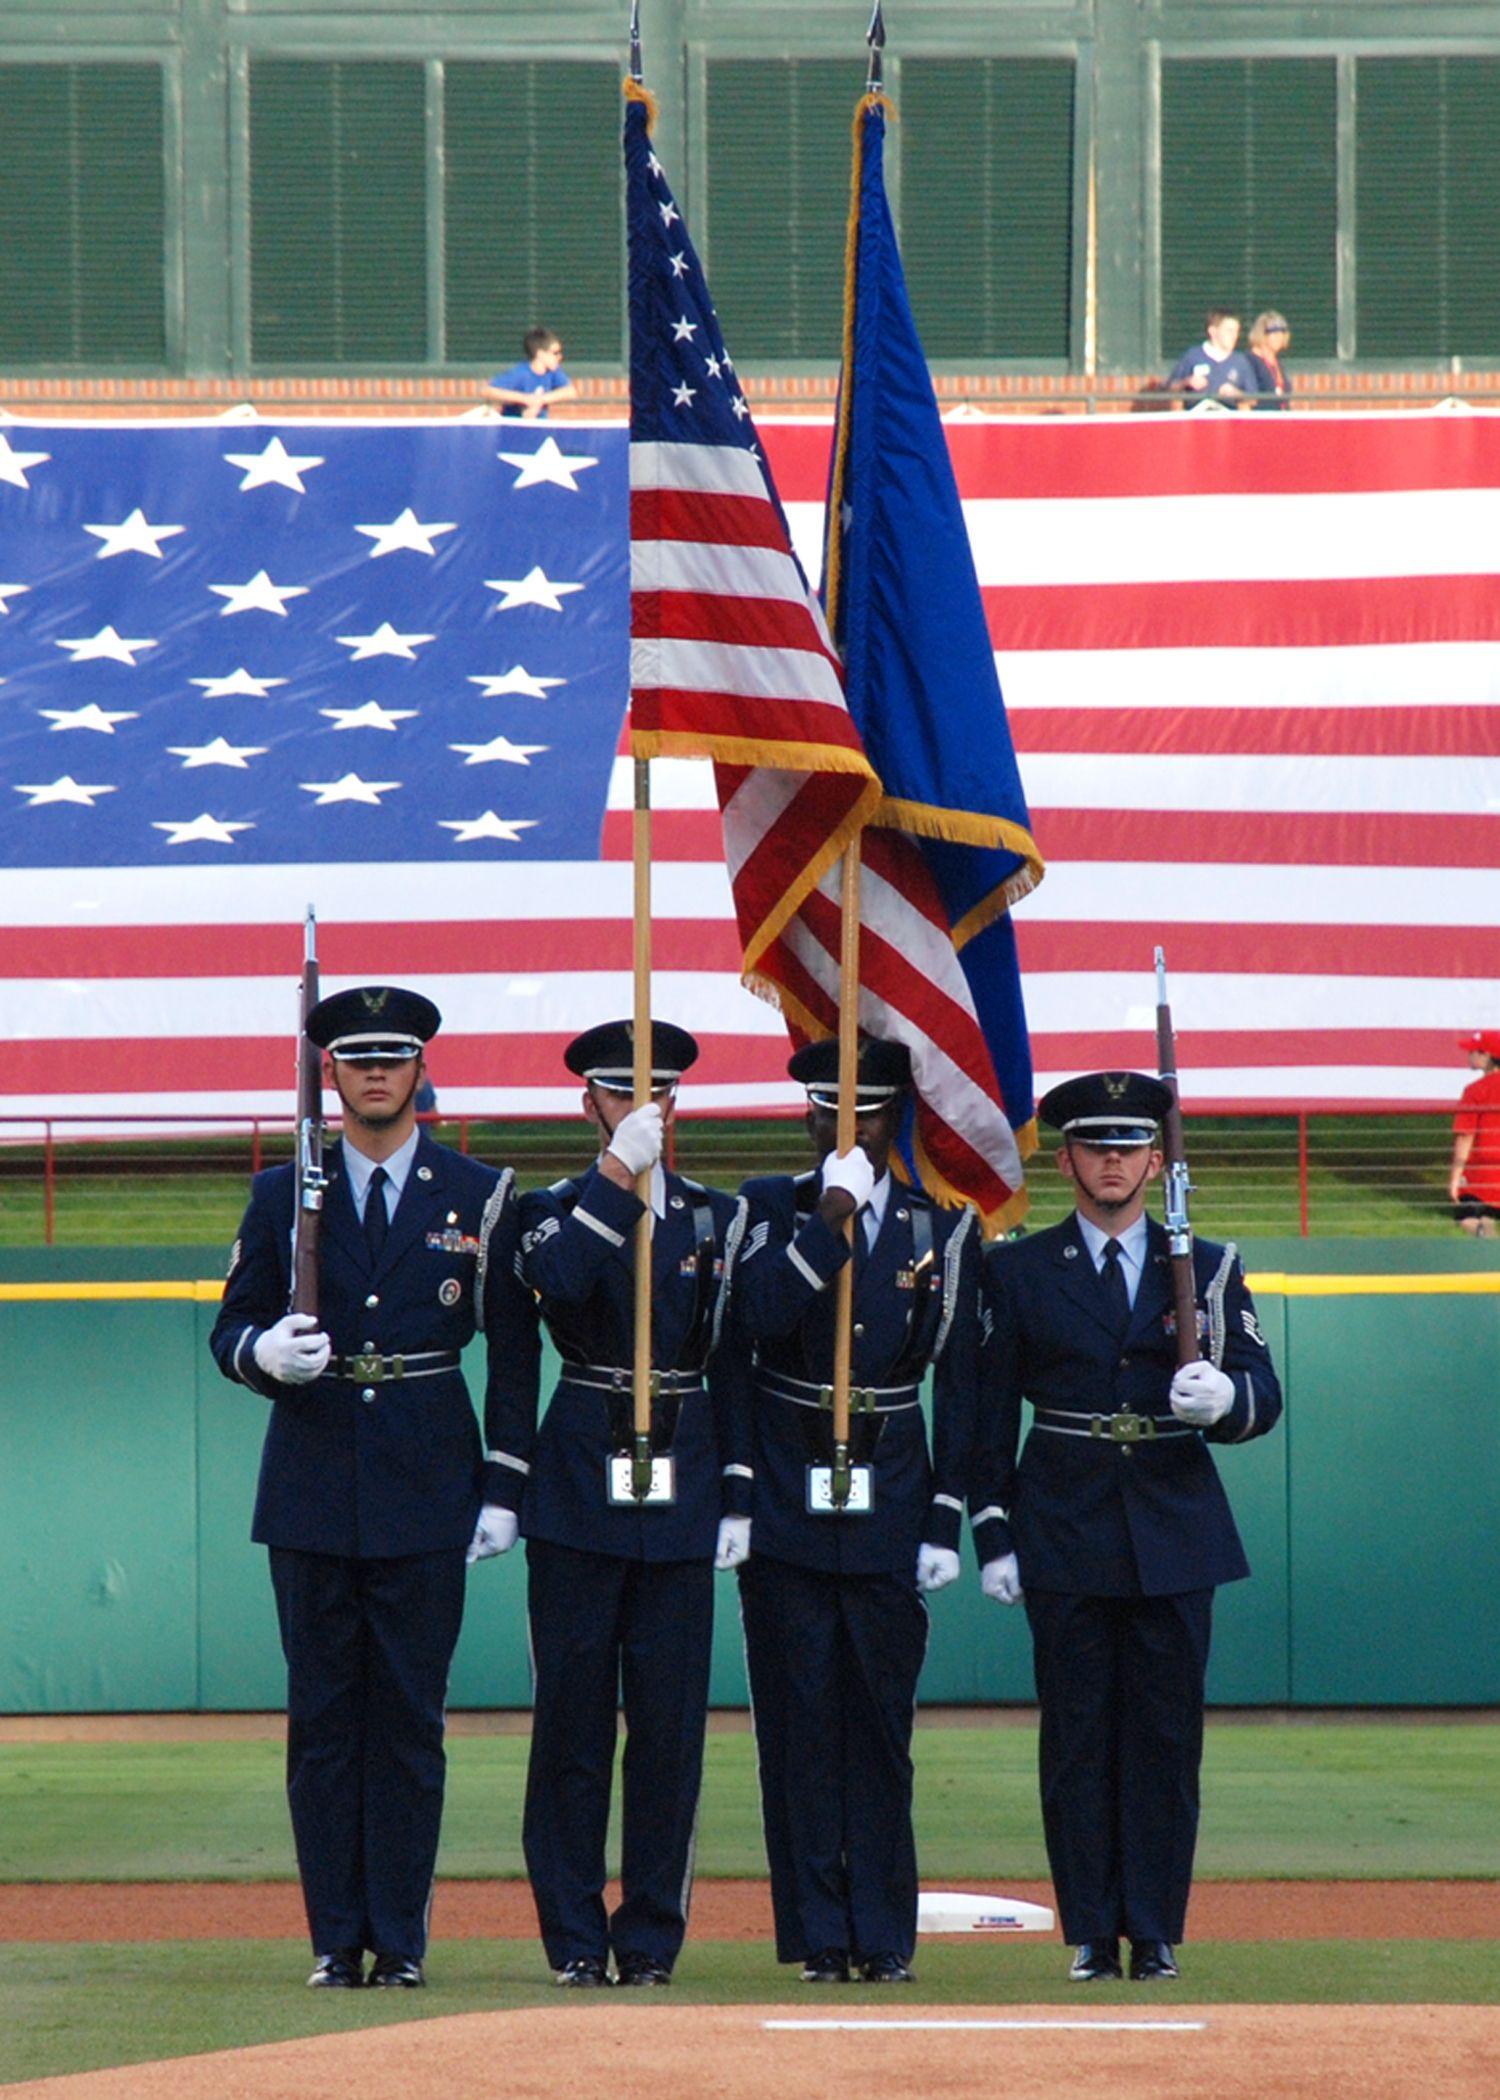 958c930db519e United States Air Force Color Guard | Patriatis Americanis | Air ...